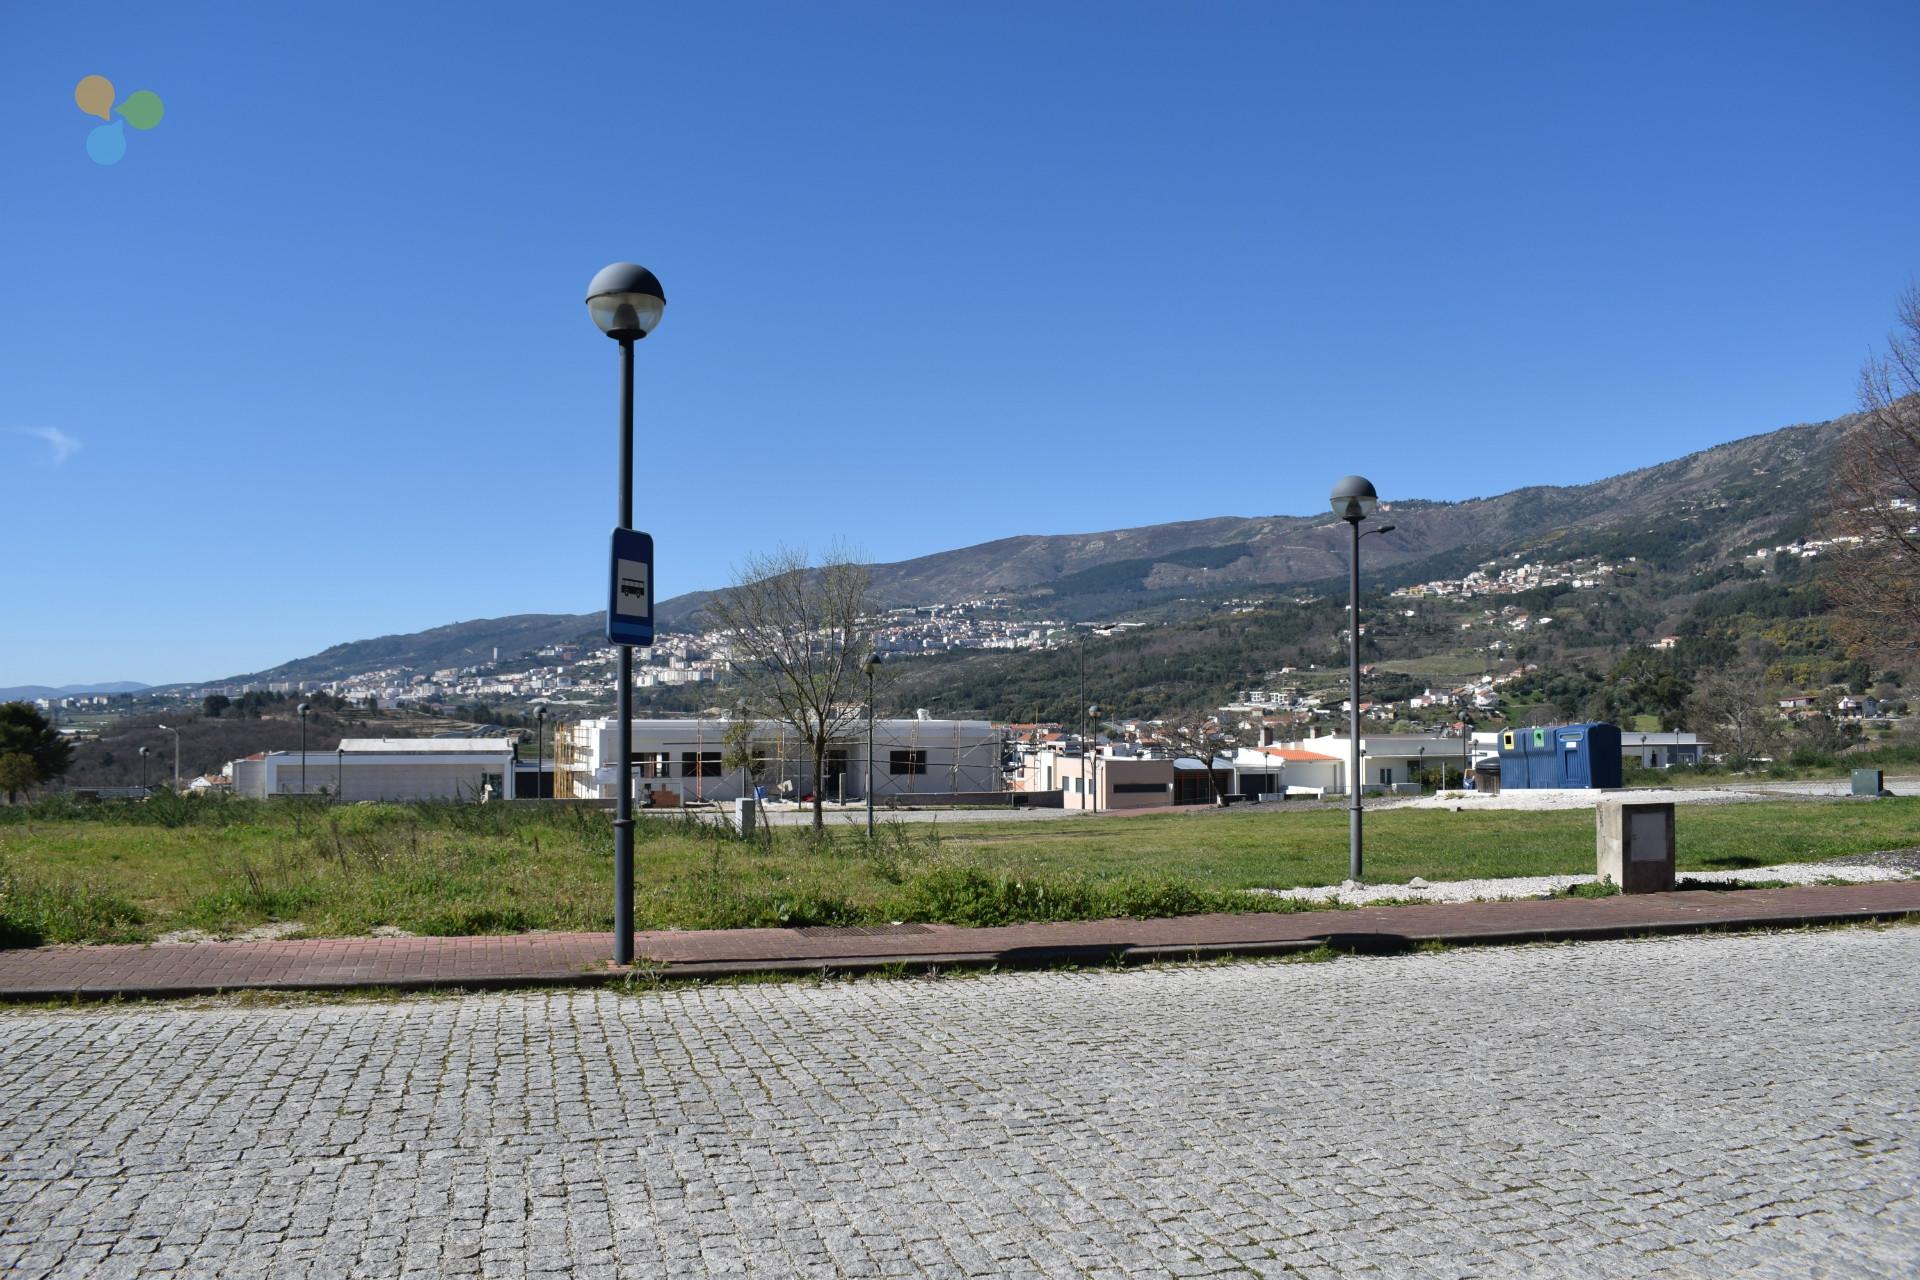 Lojas - Quinta Ponte Terra, Covilhã